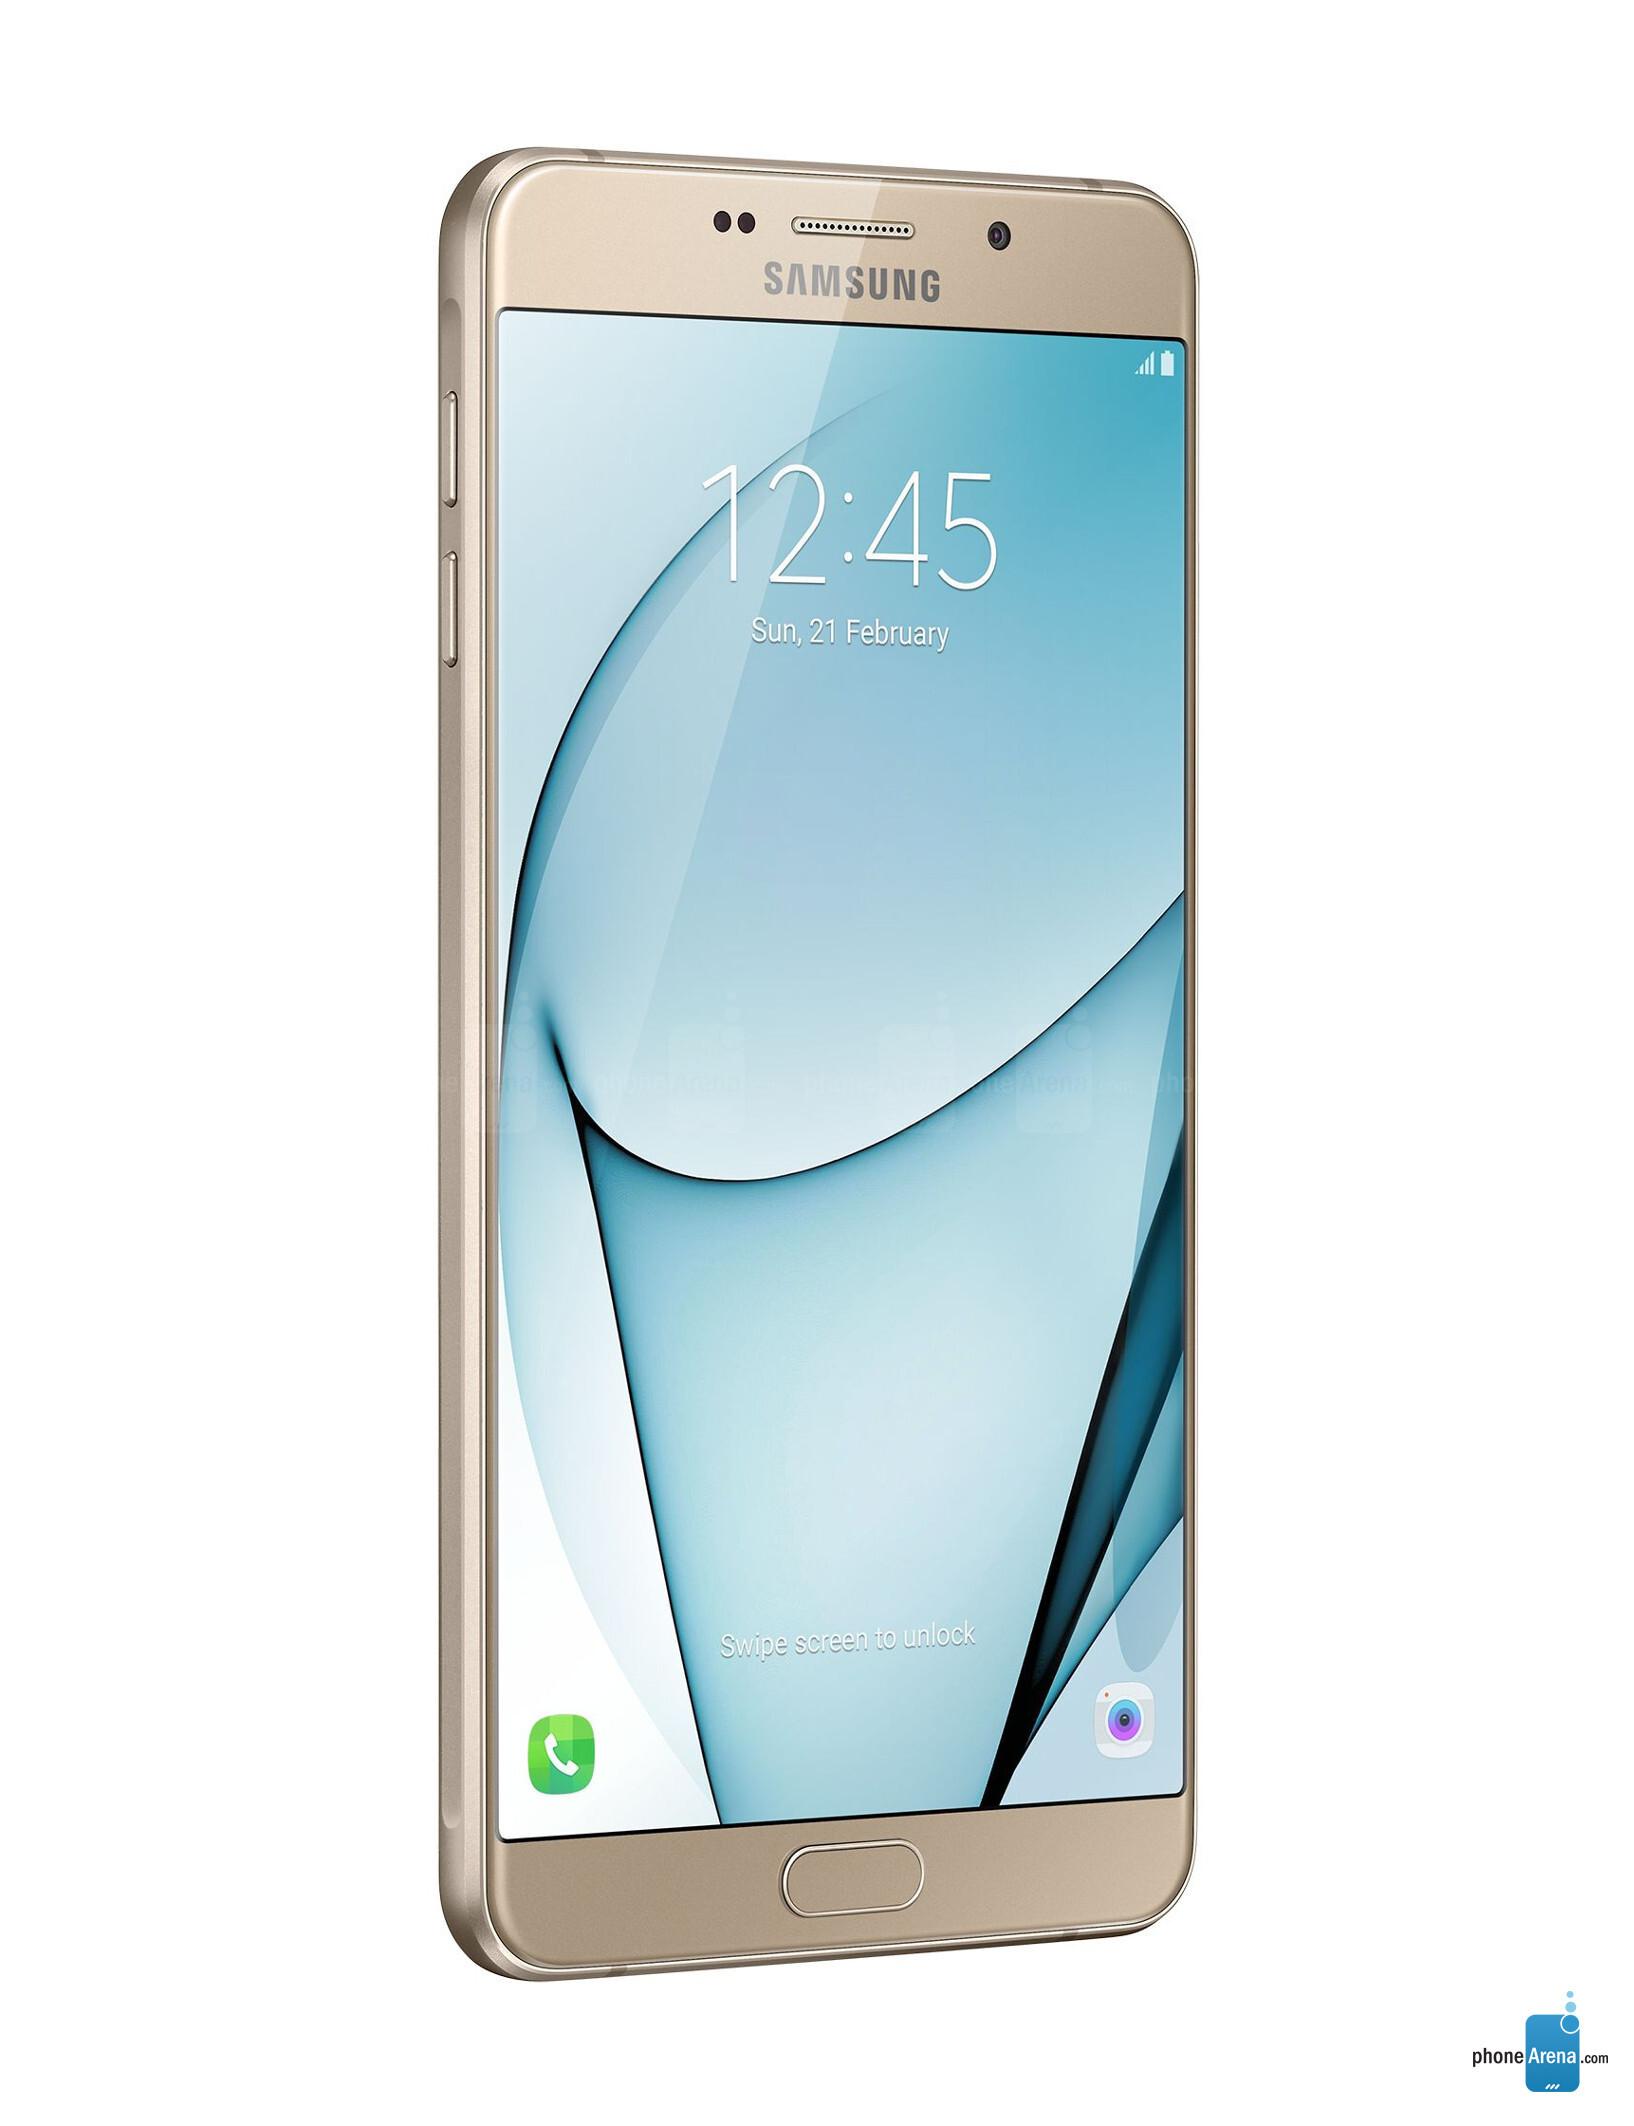 Samsung Galaxy A9 Pro (2016) specs